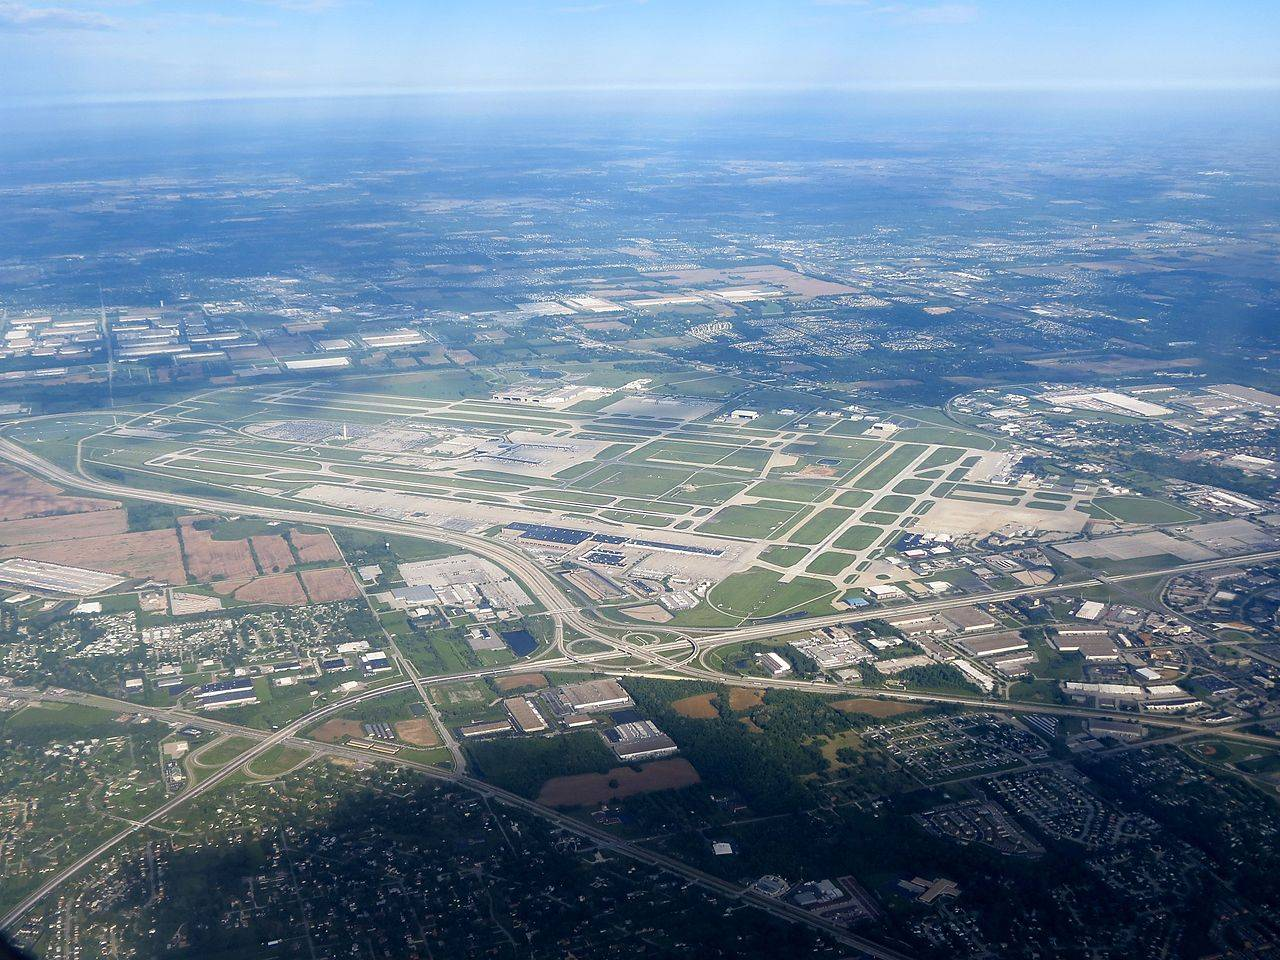 Las Vegas Developer Proposes Casino By Indianapolis Airport